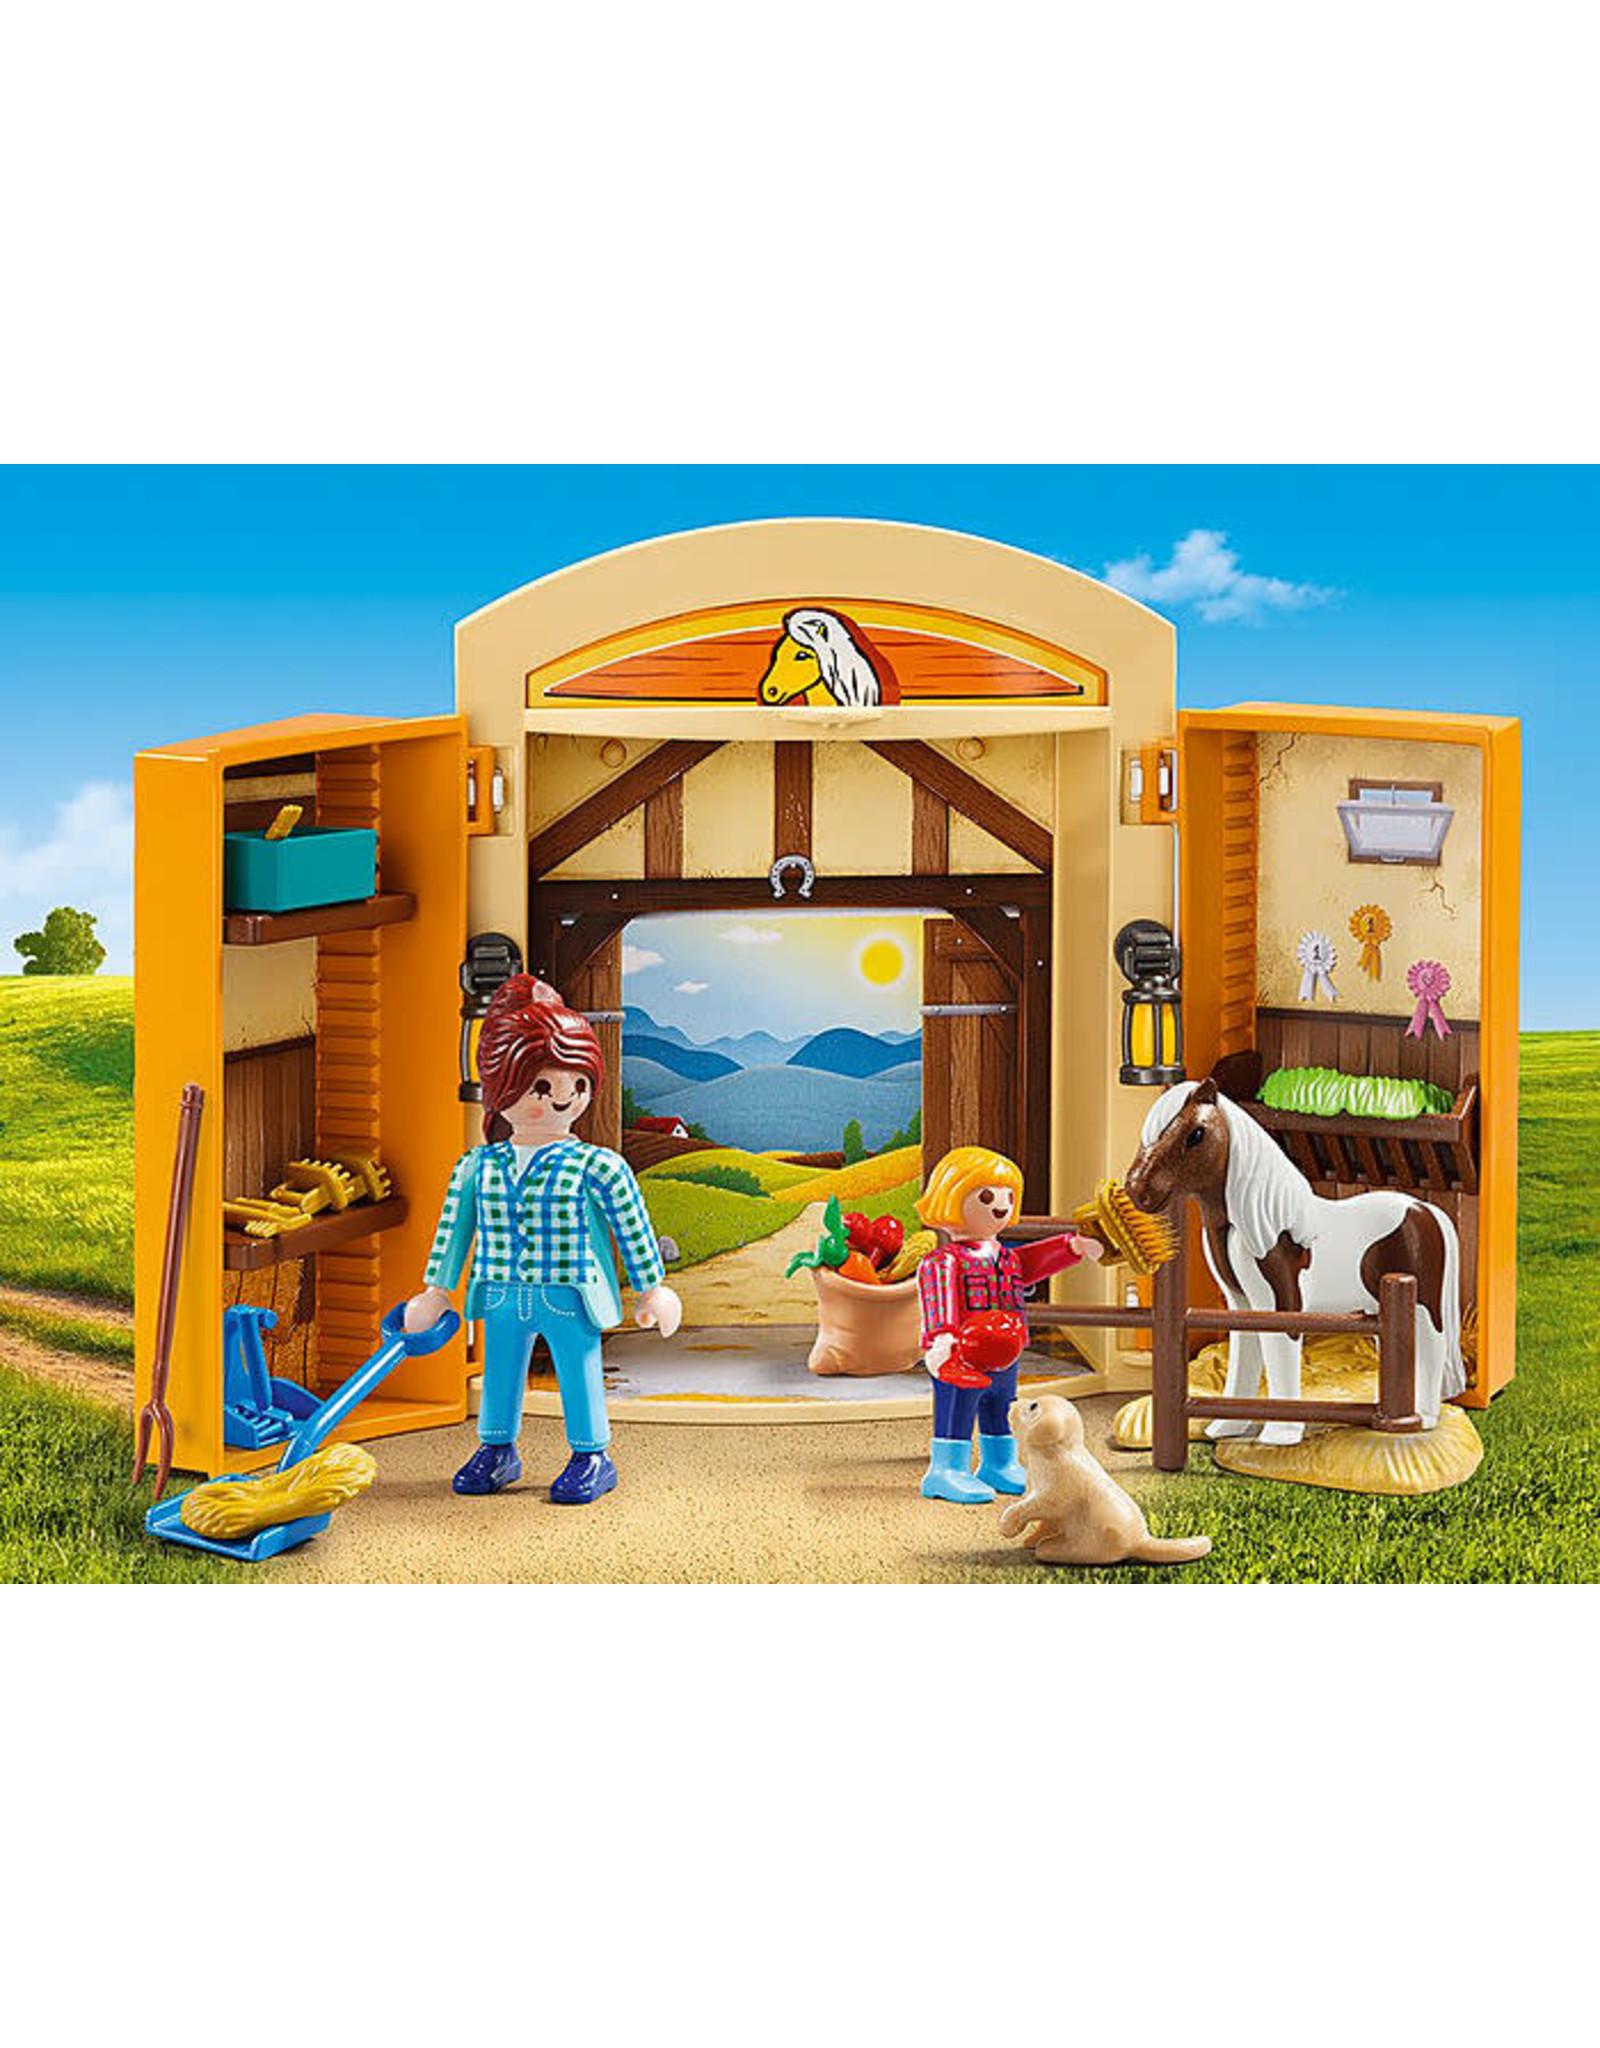 Playmobil Pony Stable Play Box